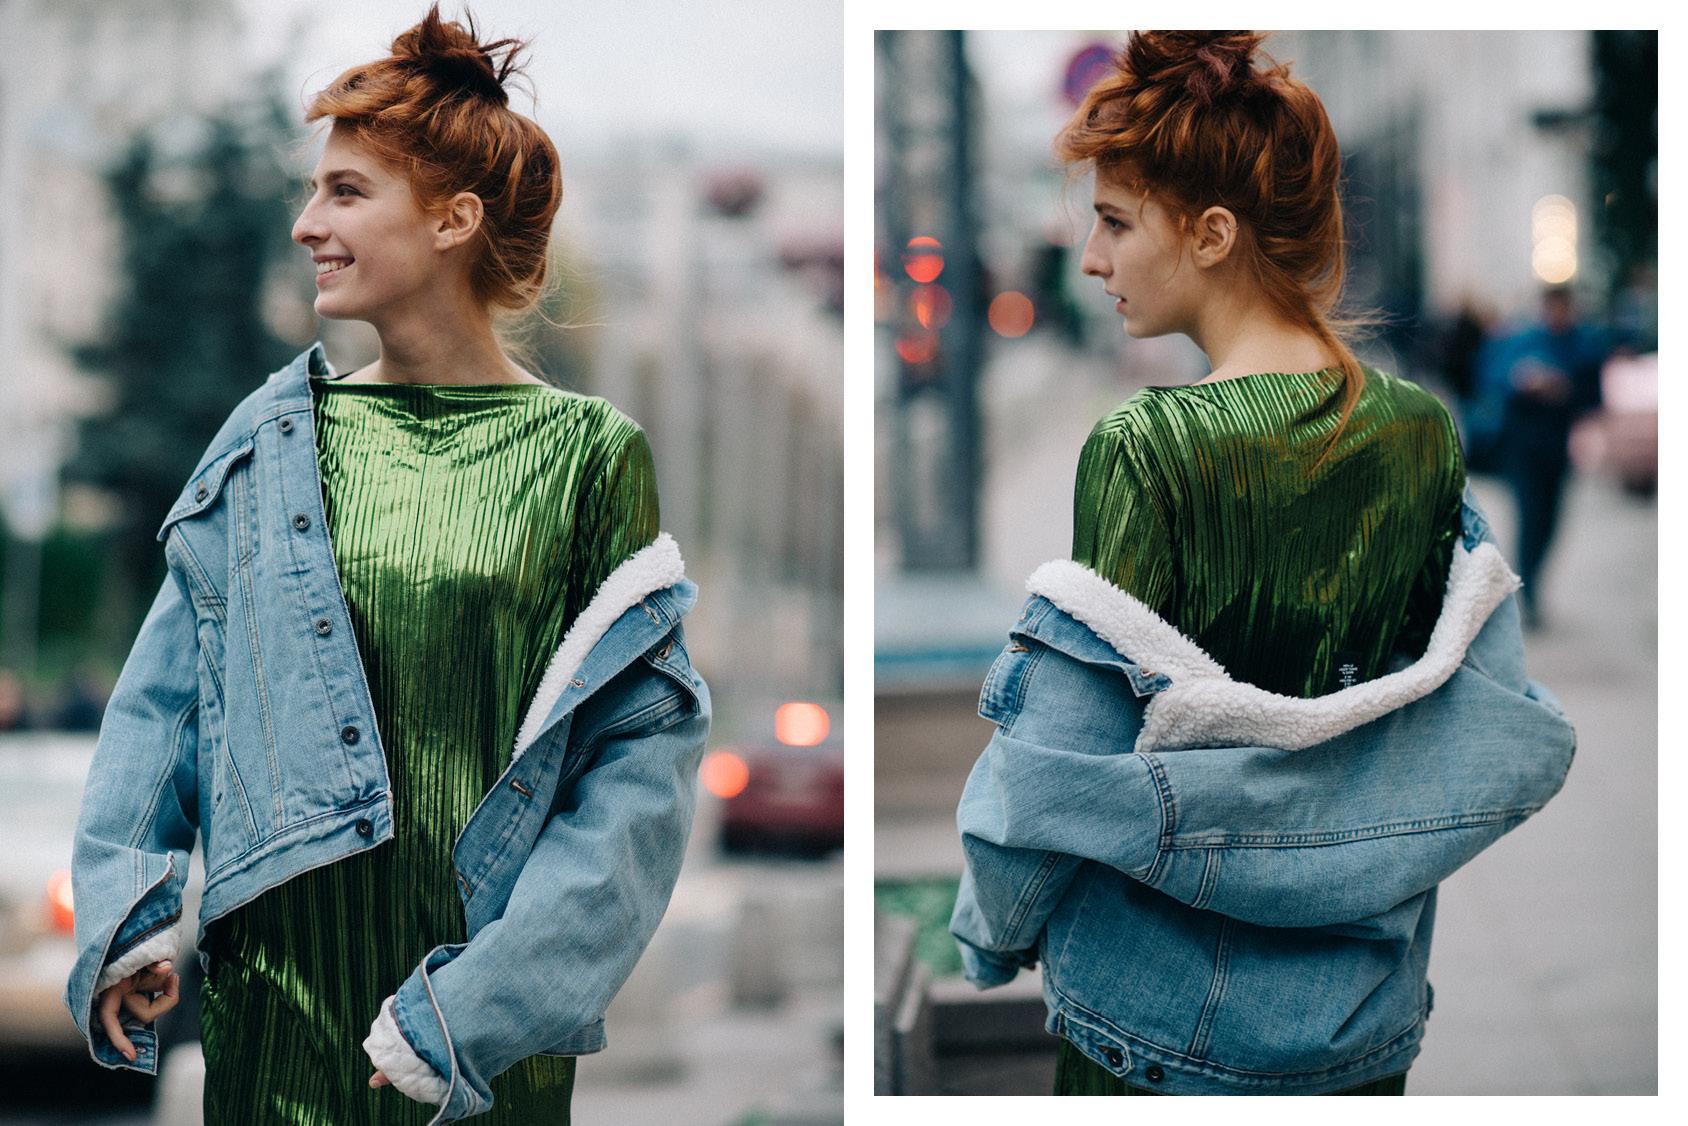 Musia Totibadze wearing H&M green dress